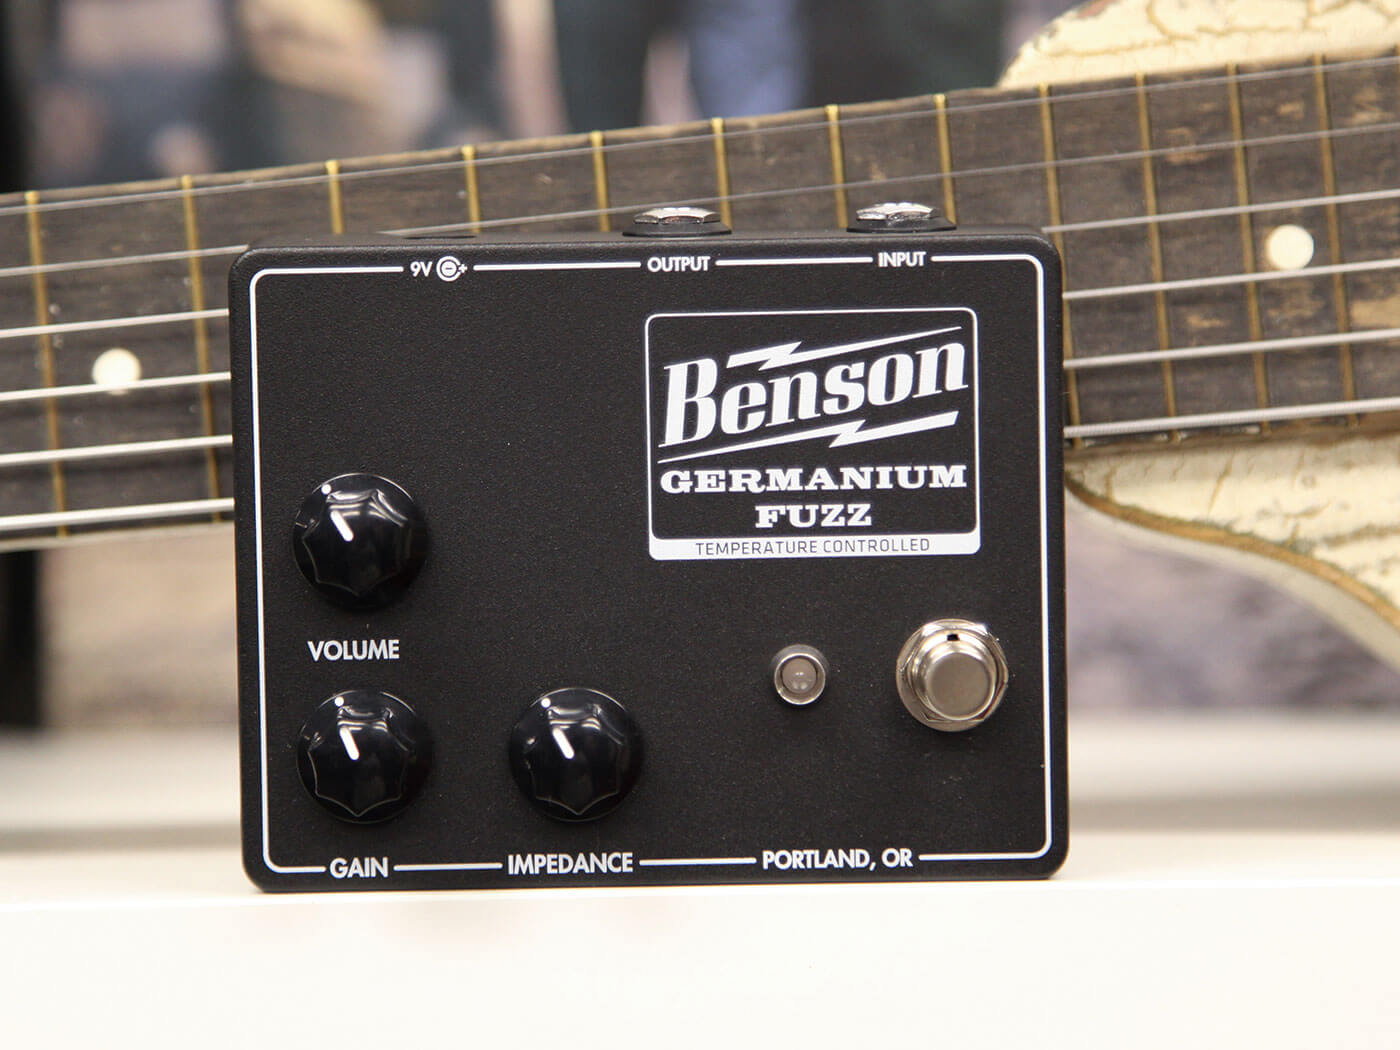 Benson's Germanium Fuzz